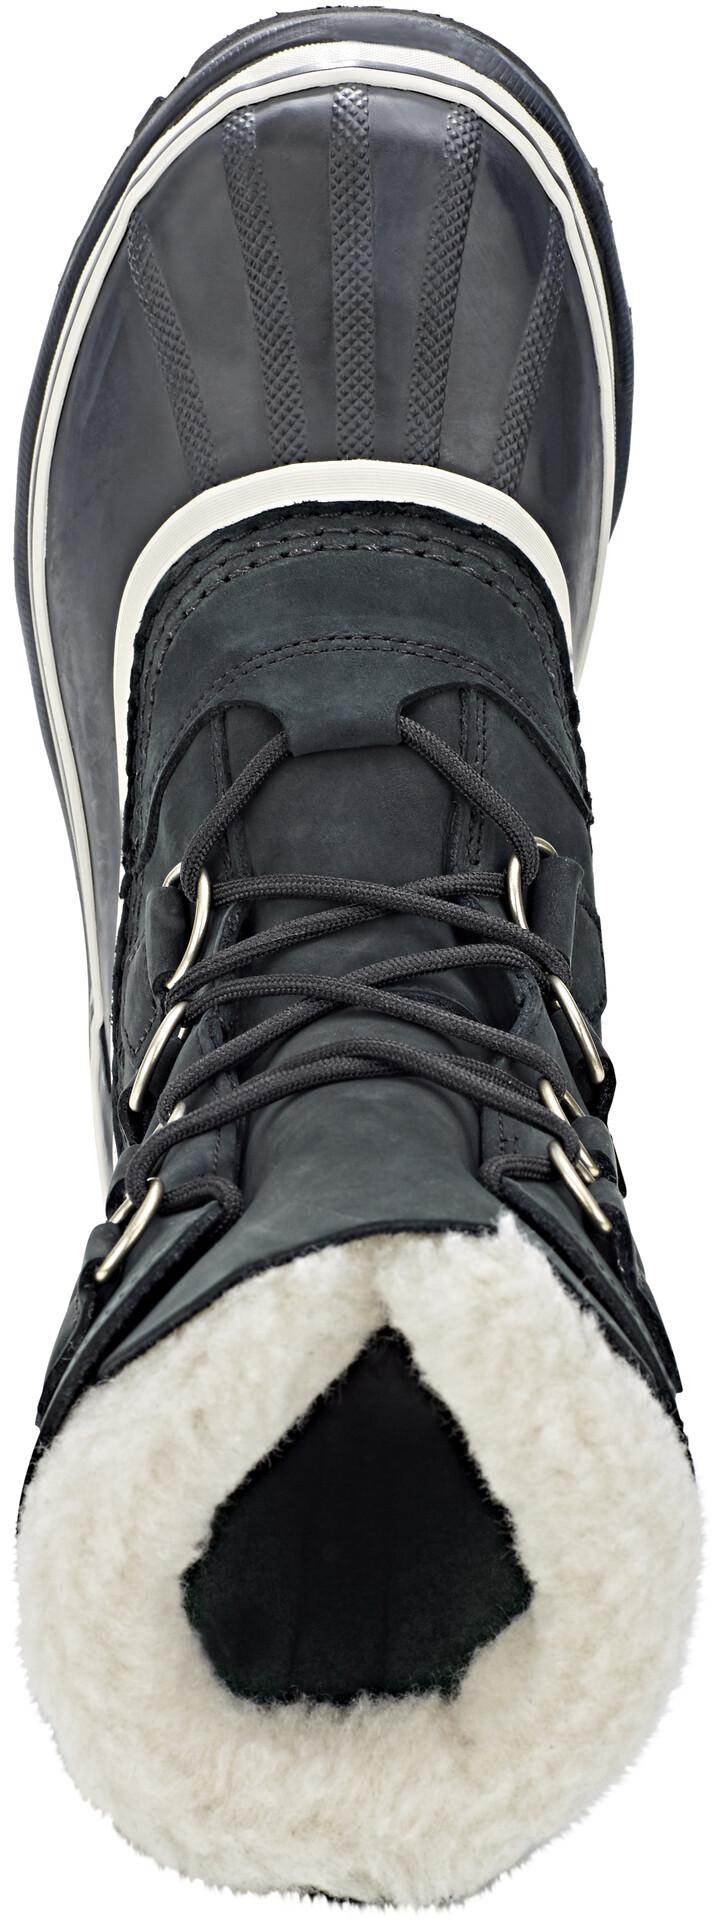 Sorel Caribou Stivali Donna, black/stone su Addnature UXayL